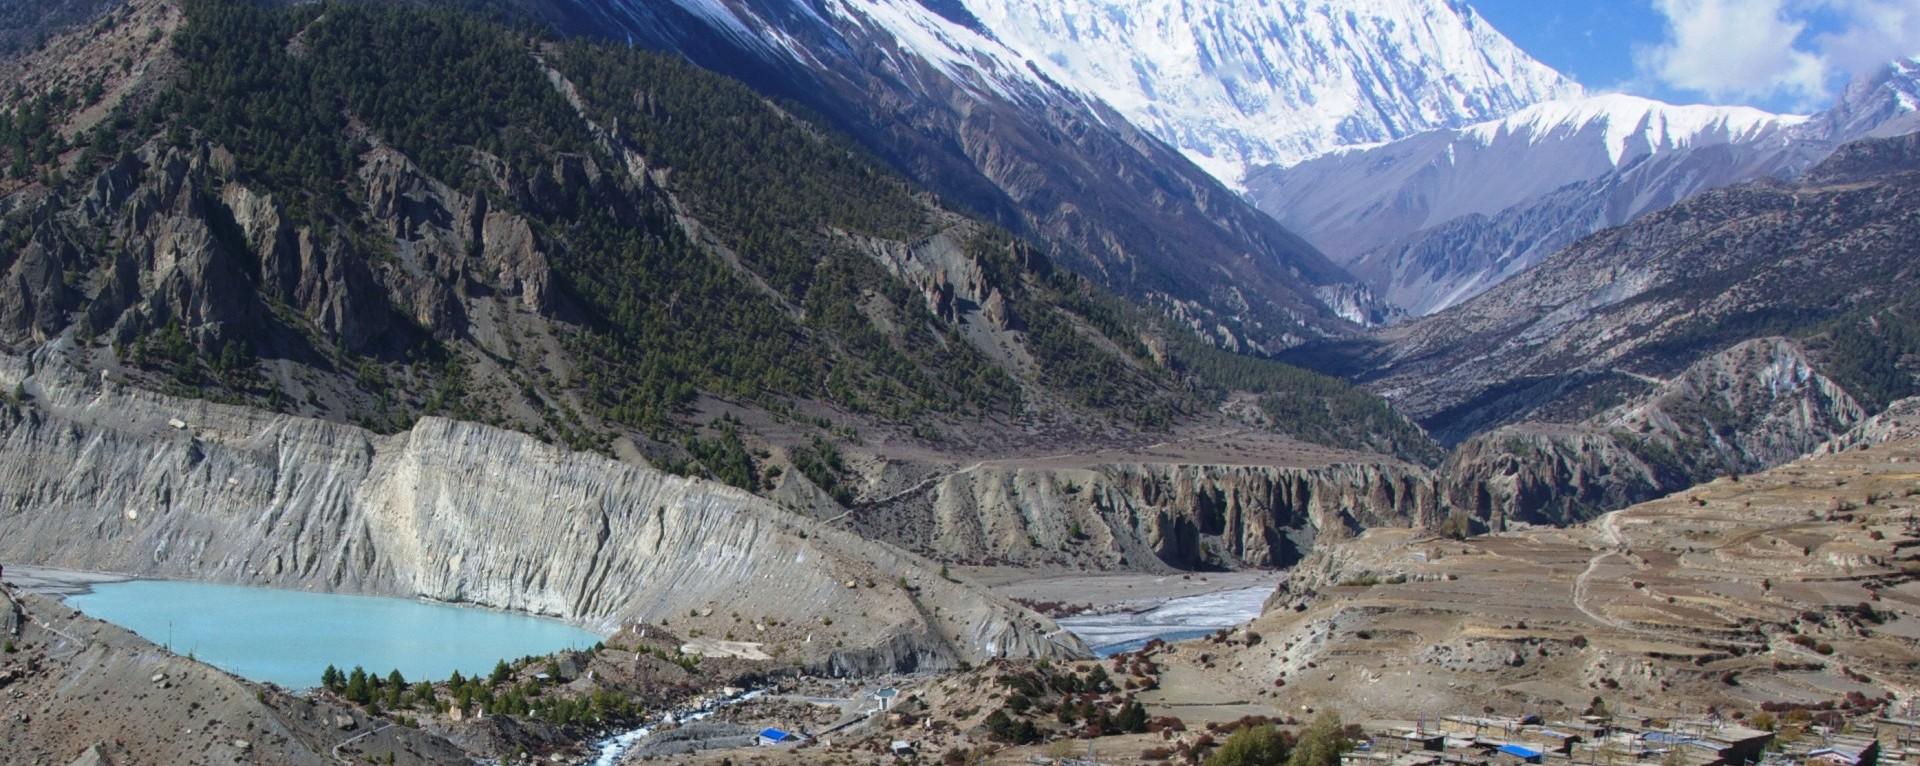 Annapurna Circuit Trek.